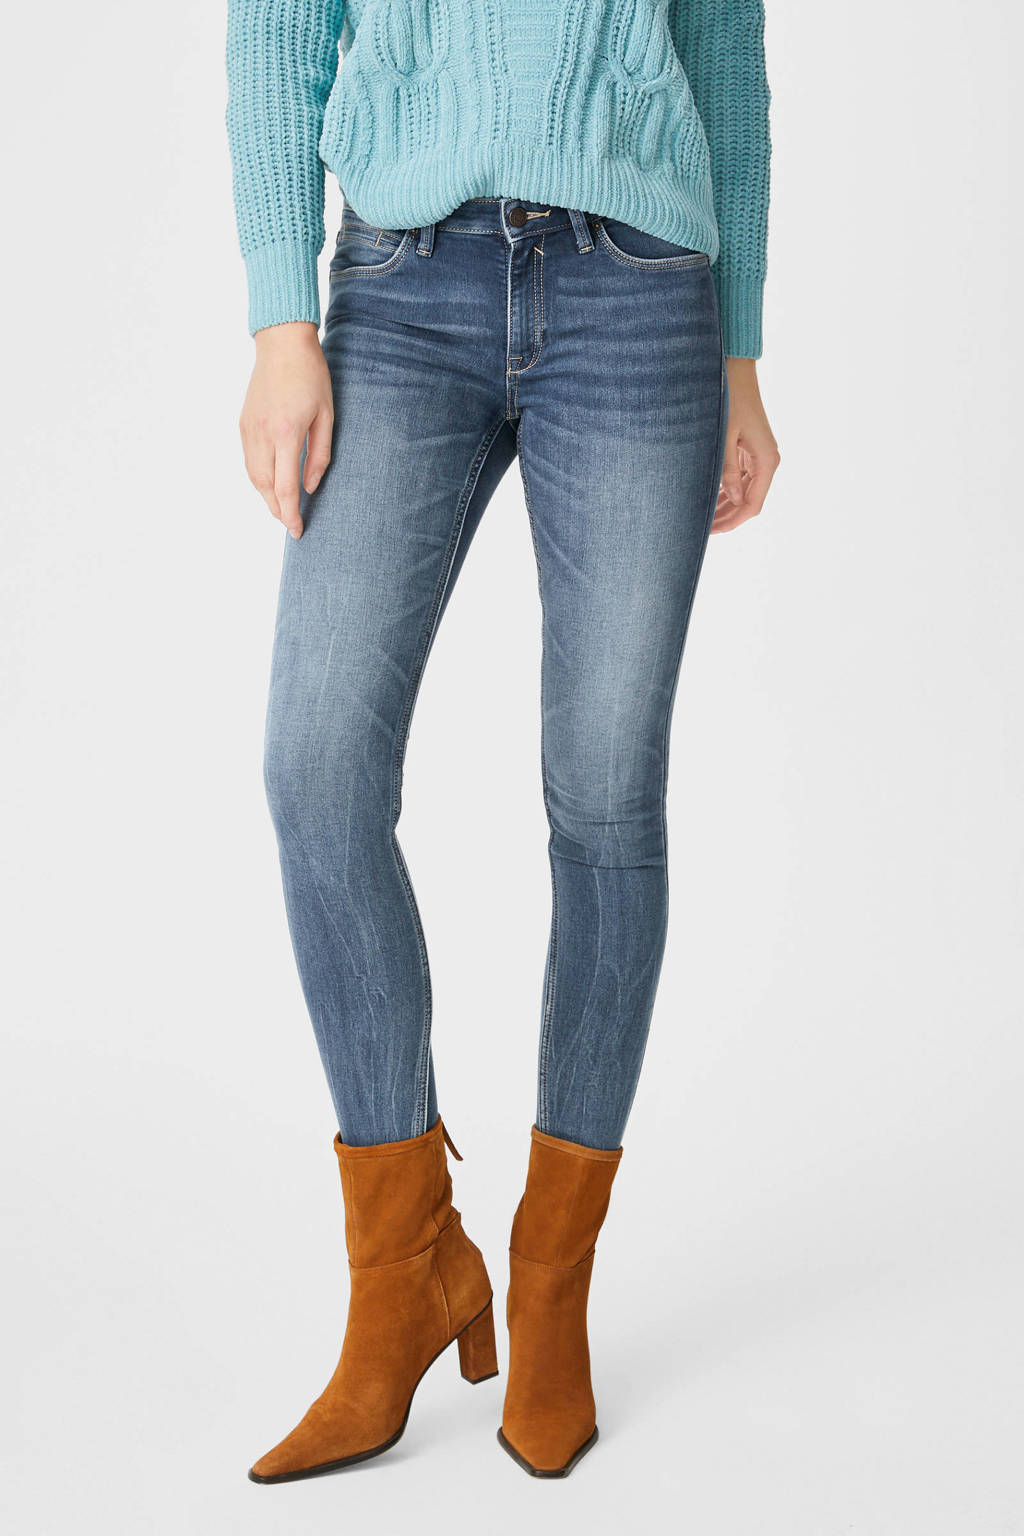 C&A The Denim low waist skinny jeans light denim stonewashed, Light denim stonewashed